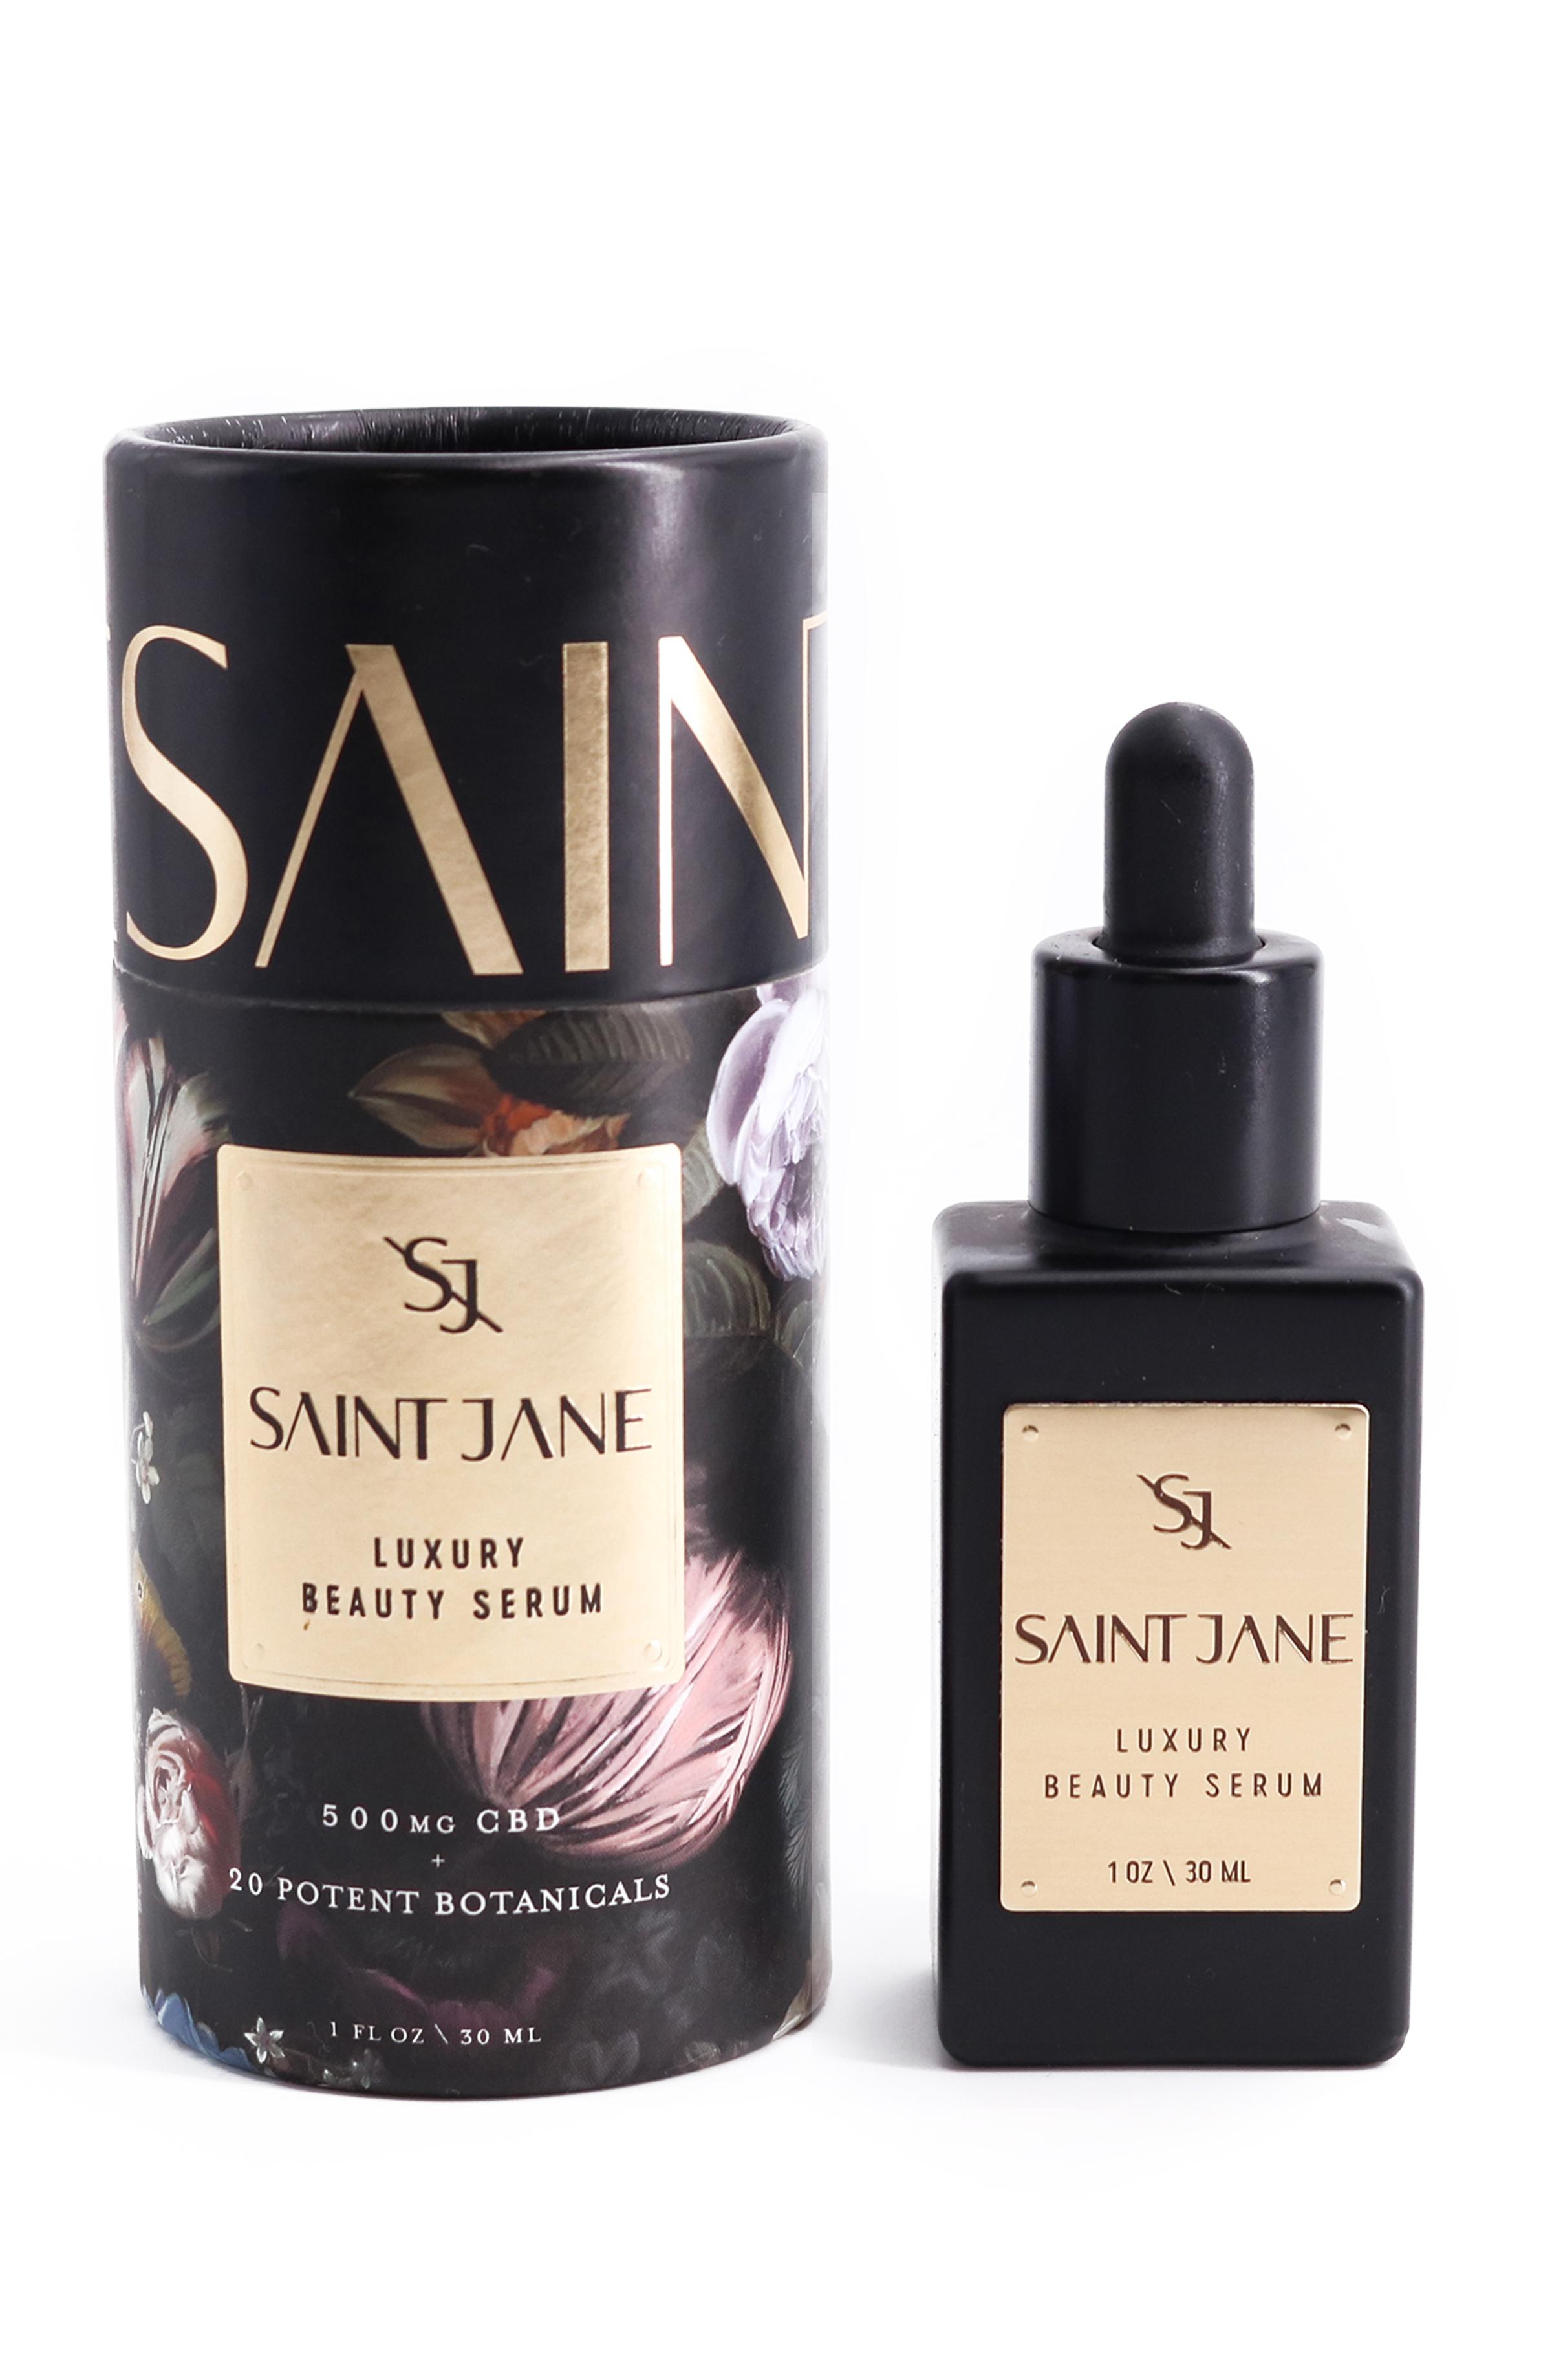 Saint Jane Luxury Beauty Serum HK$1,100/30ml 500毫克全譜大麻二酚 品牌得獎的強效面部精華,能糾正多種肌膚問題的混合配方。每瓶蘊含20種植物精華,深層保濕及回復肌膚光澤。適合衰老肌膚,有效對抗紅印。